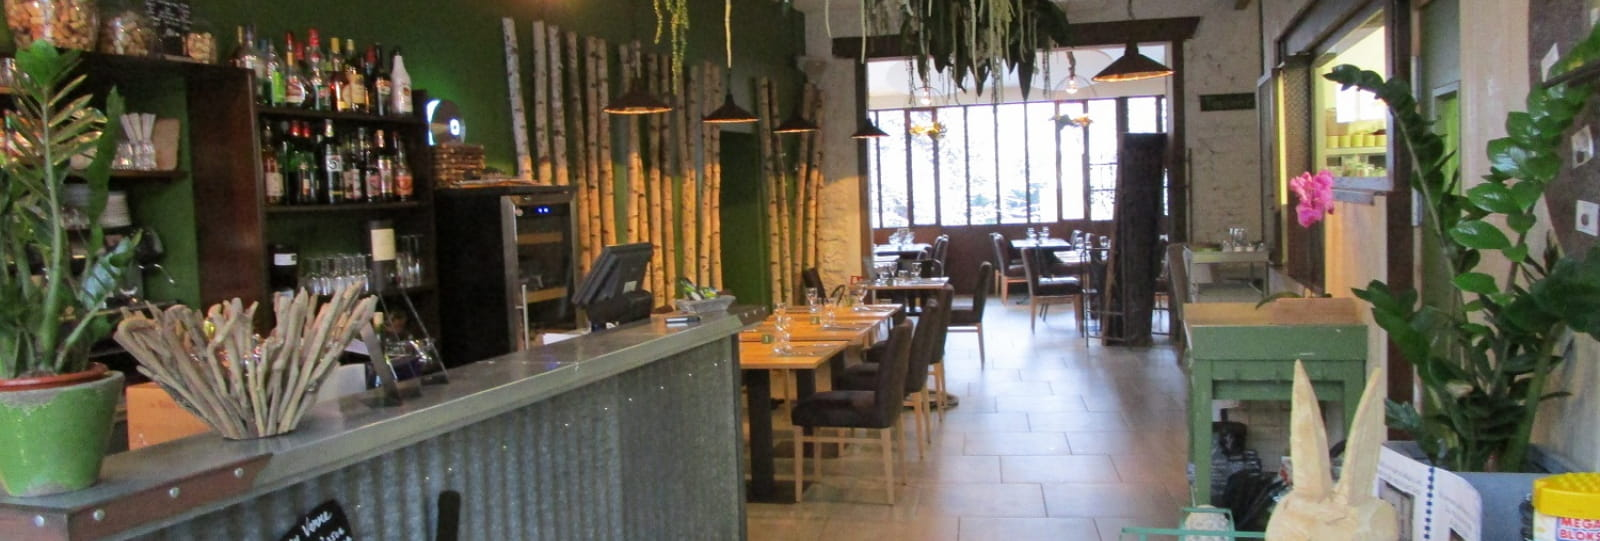 Restaurant Au jardin gourmand_Saint Donat